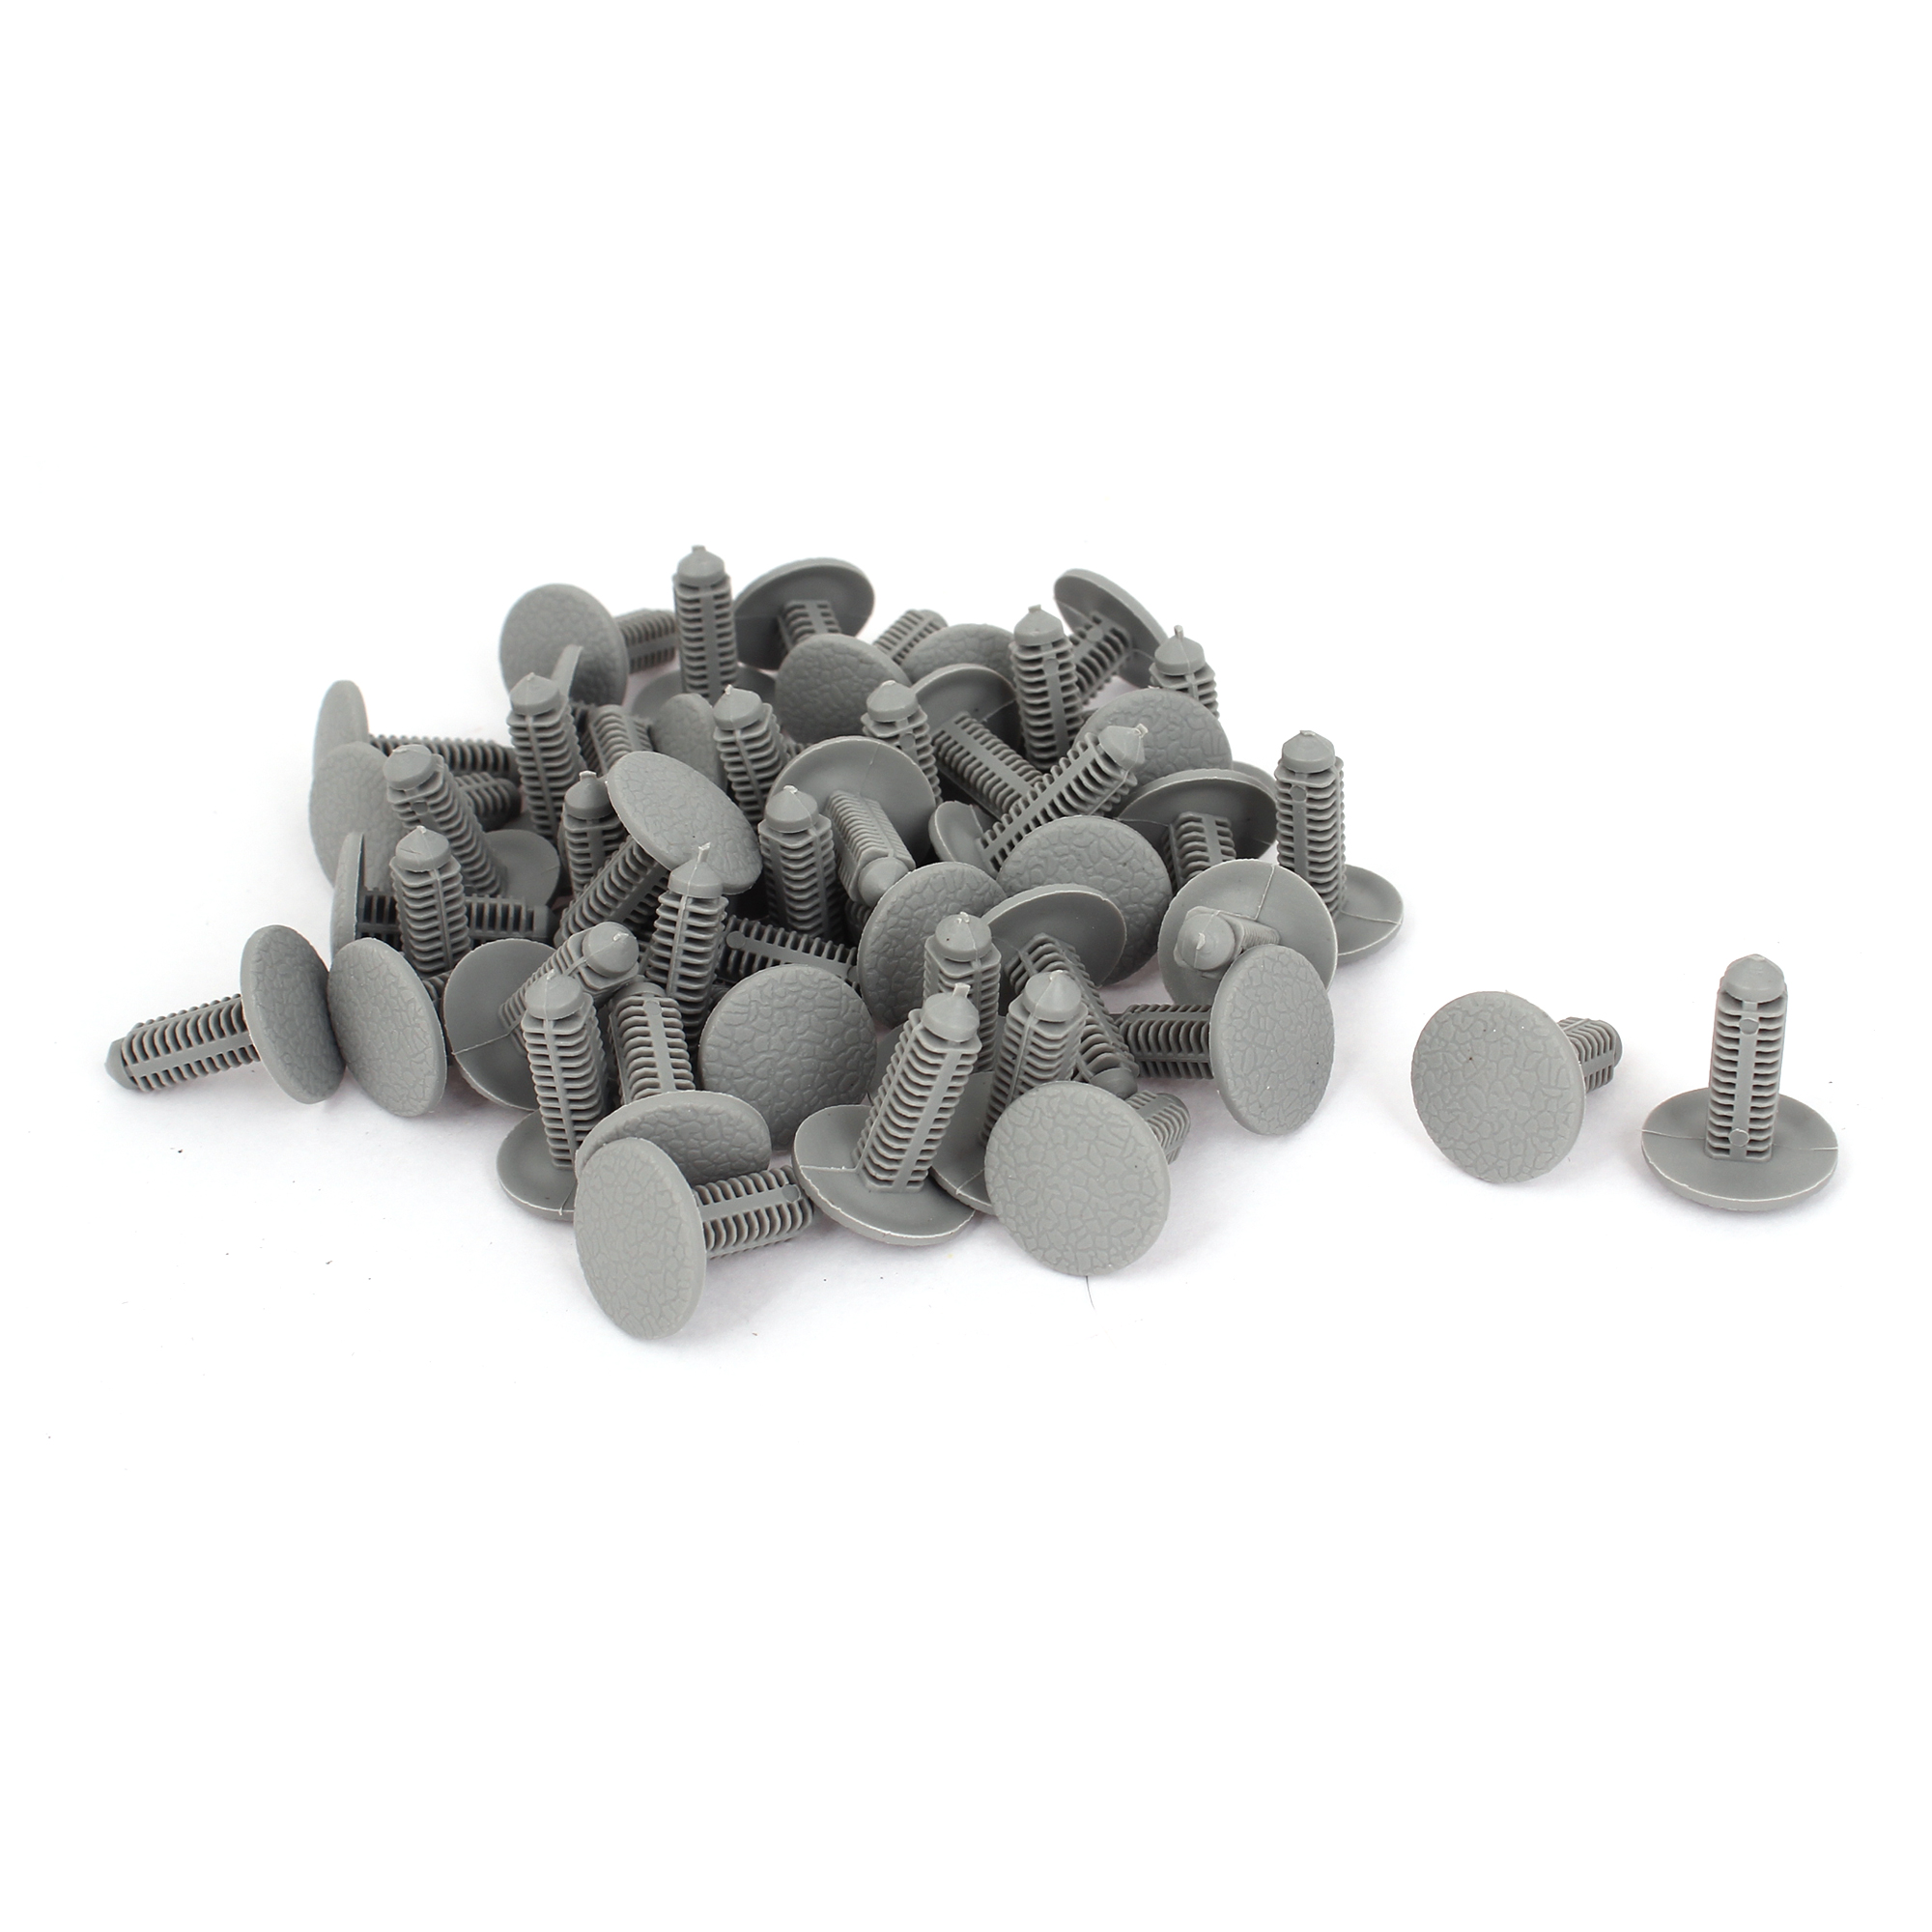 50 Pcs Gray Plastic Rivet Fastener Mud Flaps Bumper Fender Clips 7mm x 19mm x 22mm